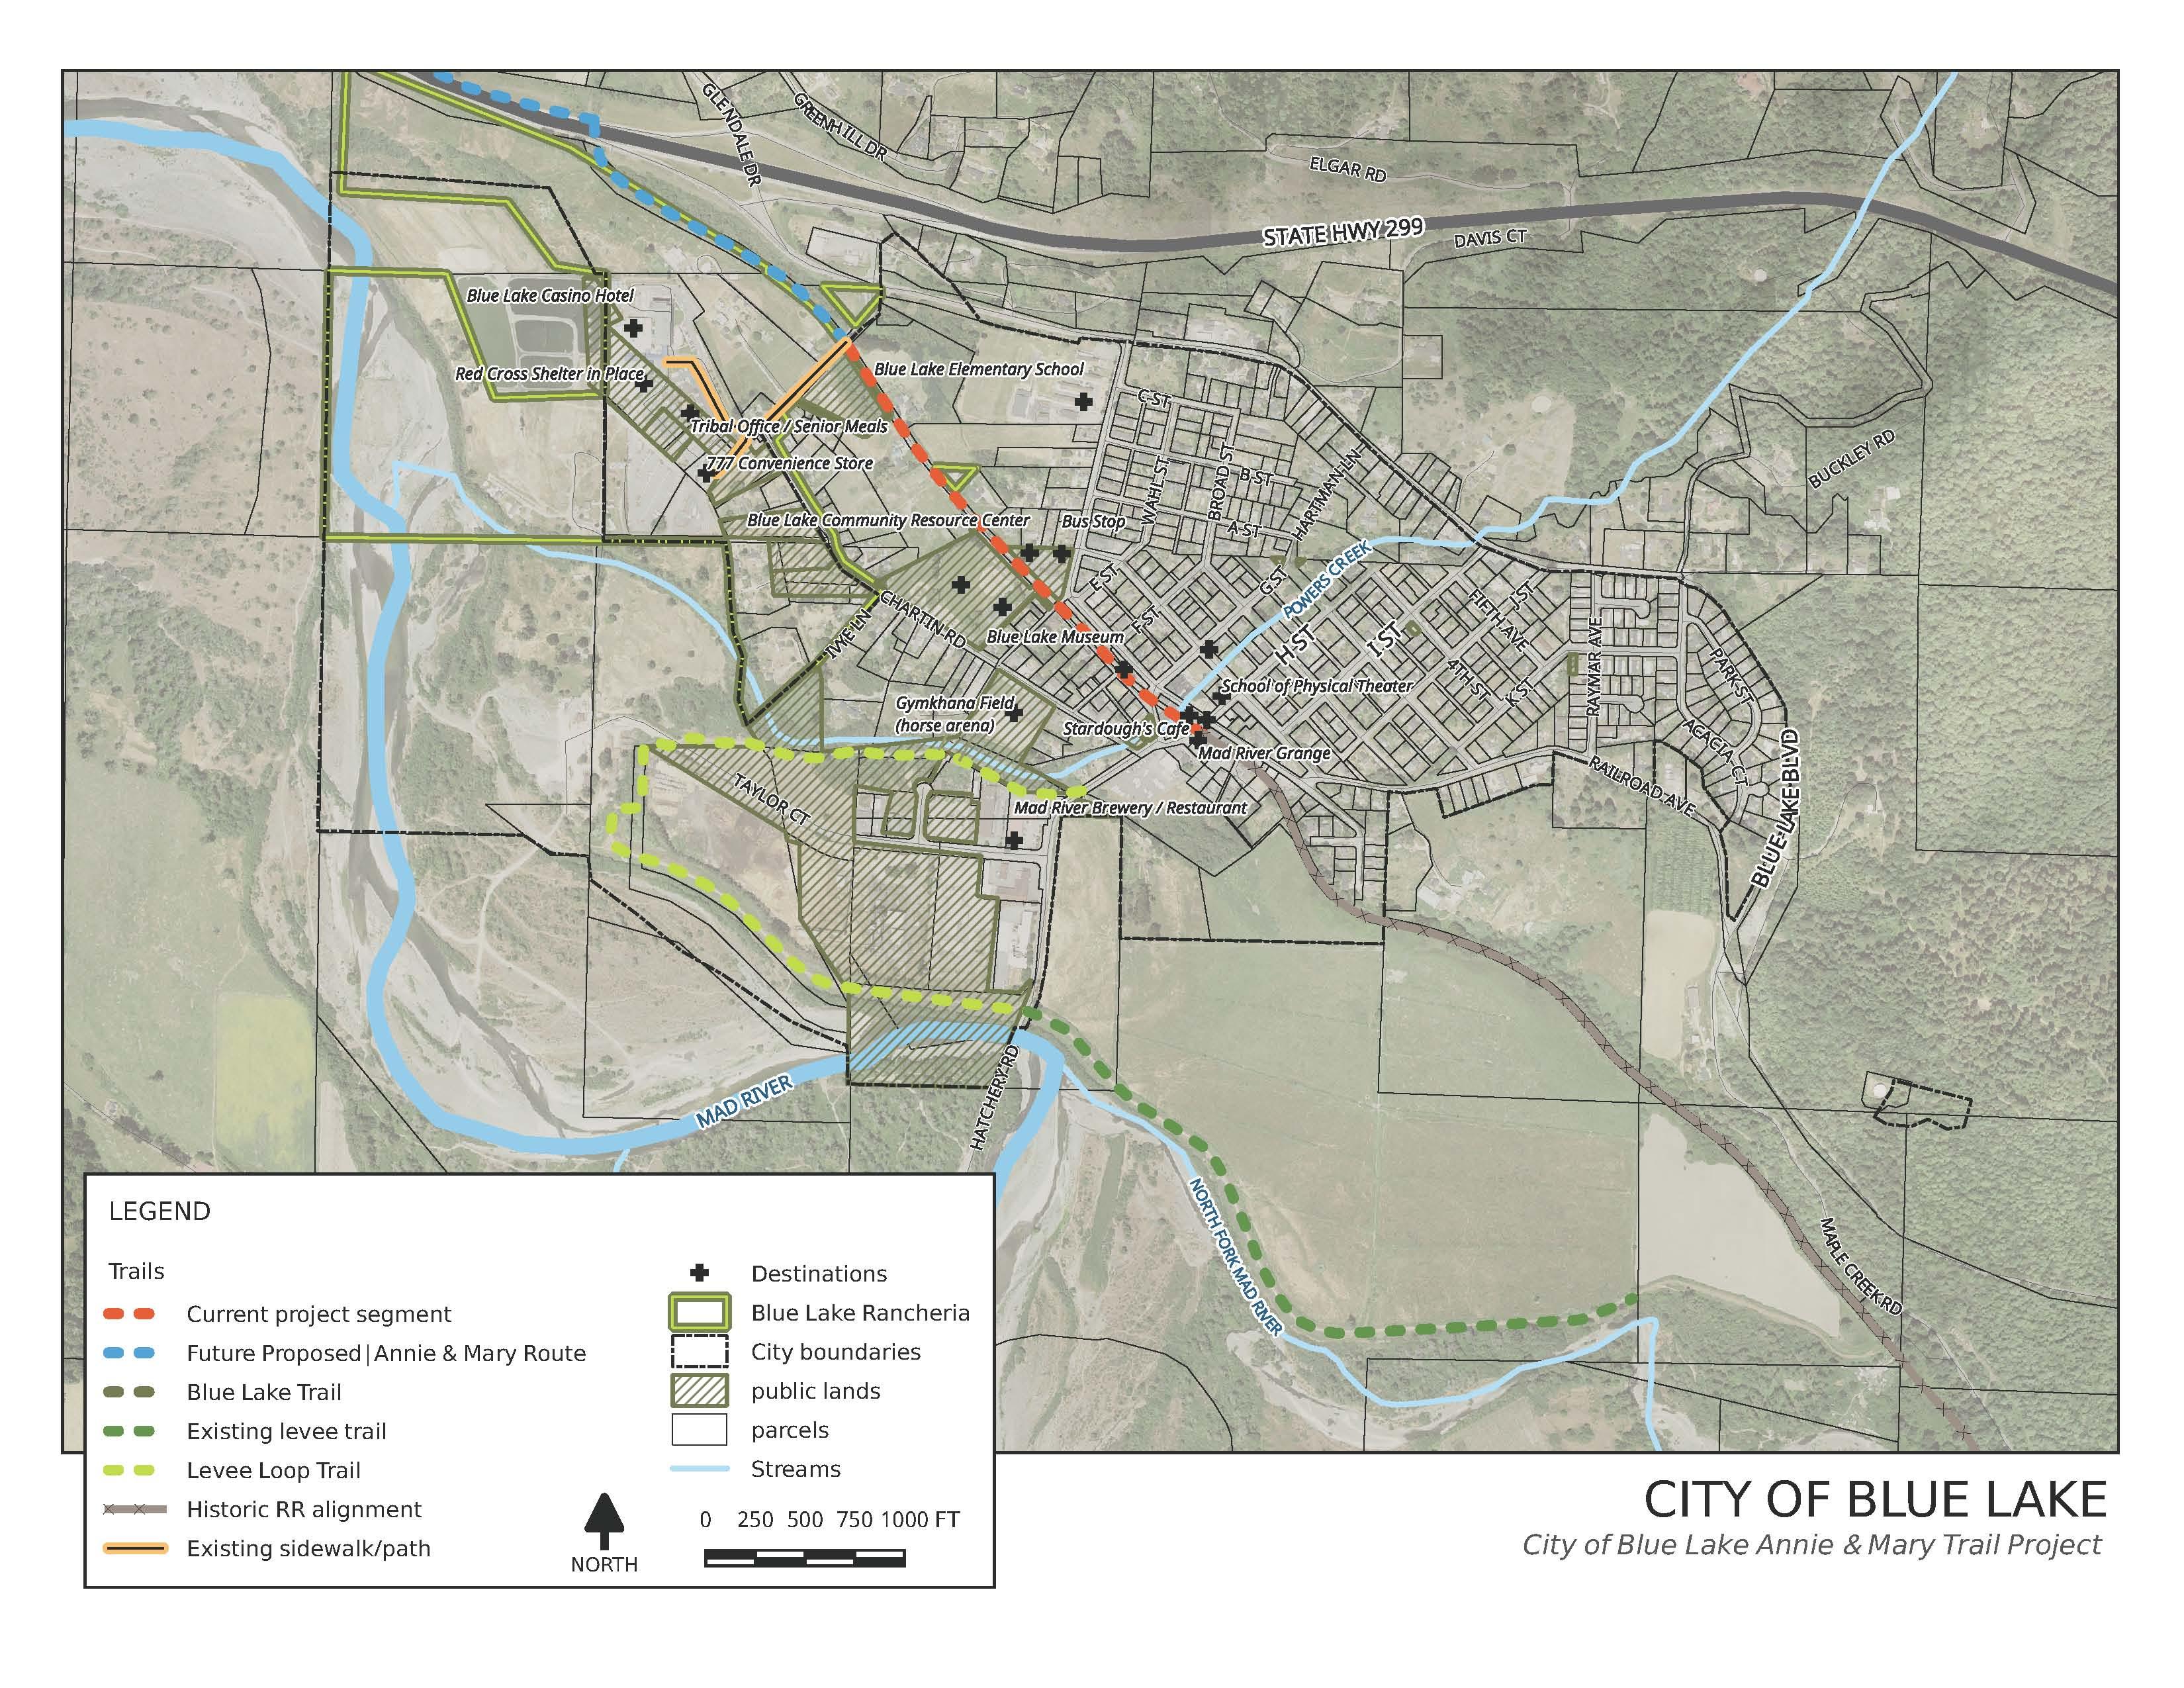 City of Blue Lake Map